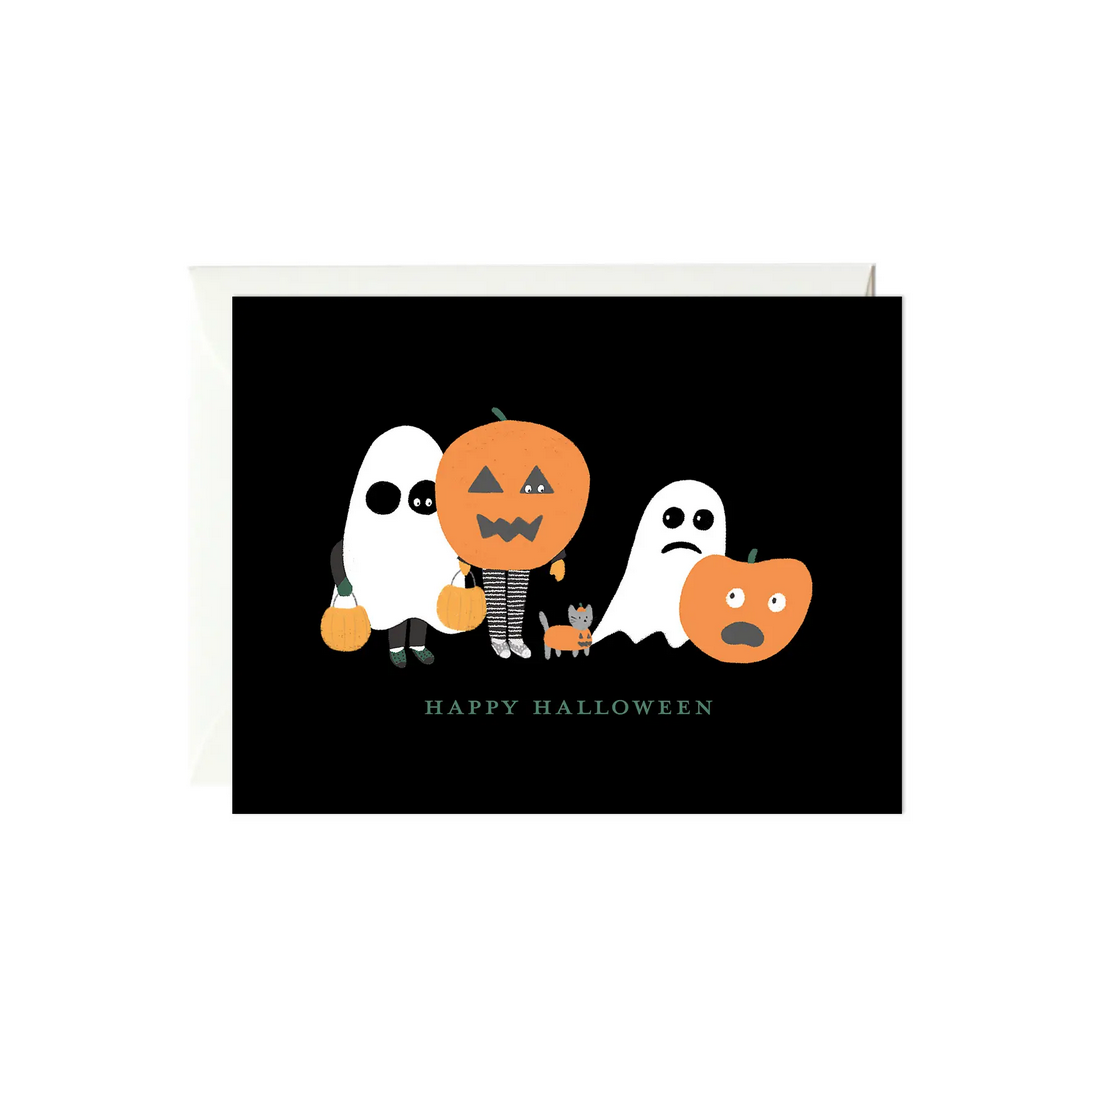 Paula & Waffle - PAW Ghost and Pumpkin Halloween Card